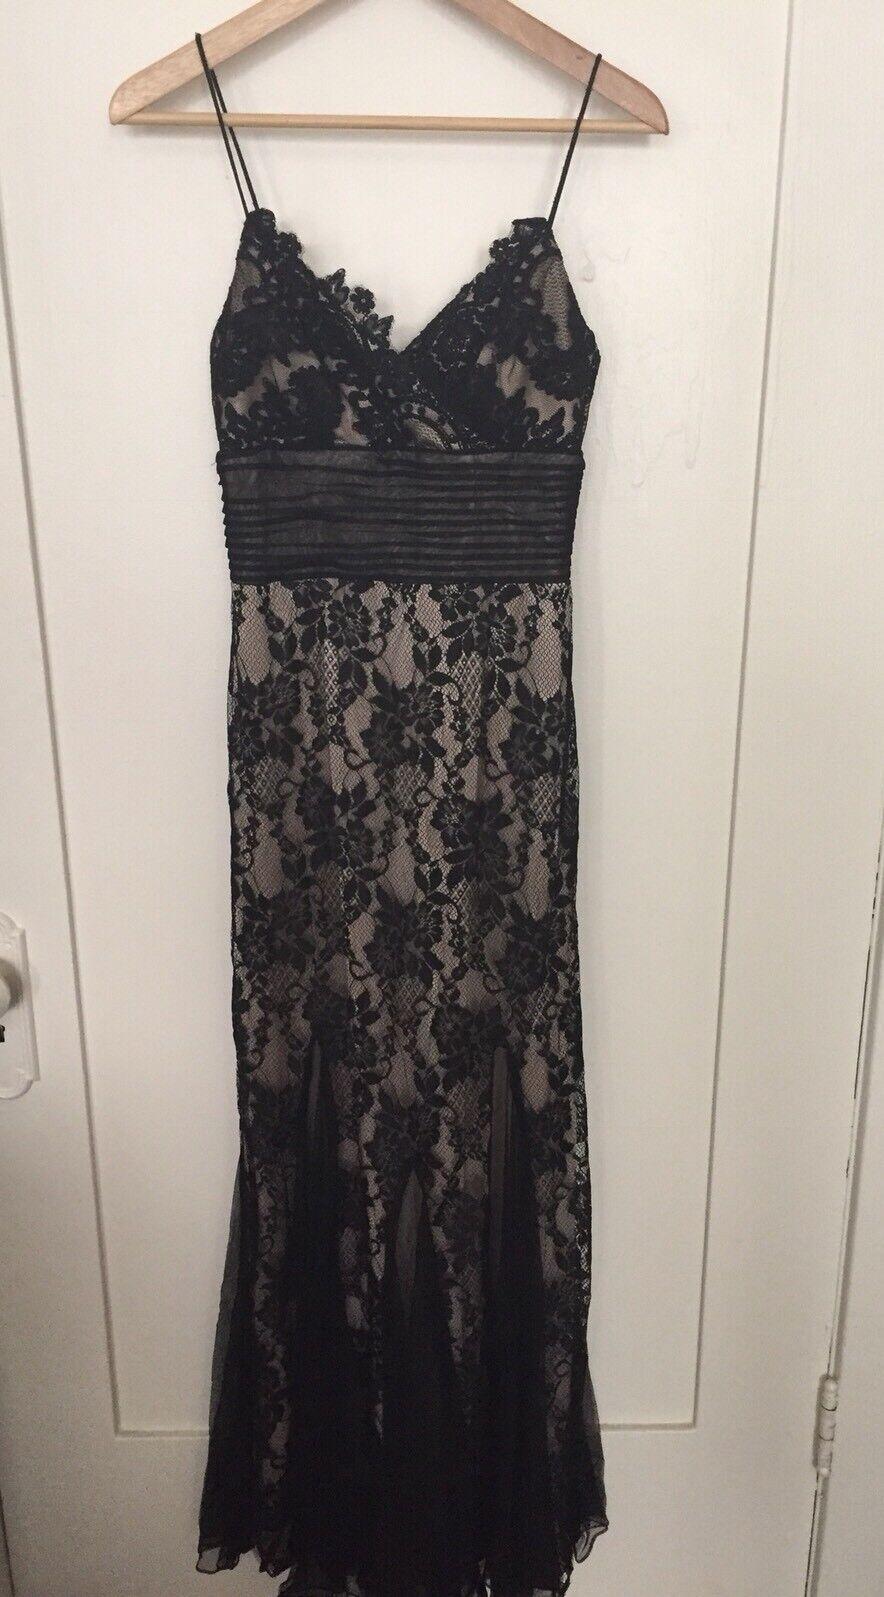 CACHE schwarz Lace Overlay Spaghetti Strap Evening Gown Prom Dress Größe 4